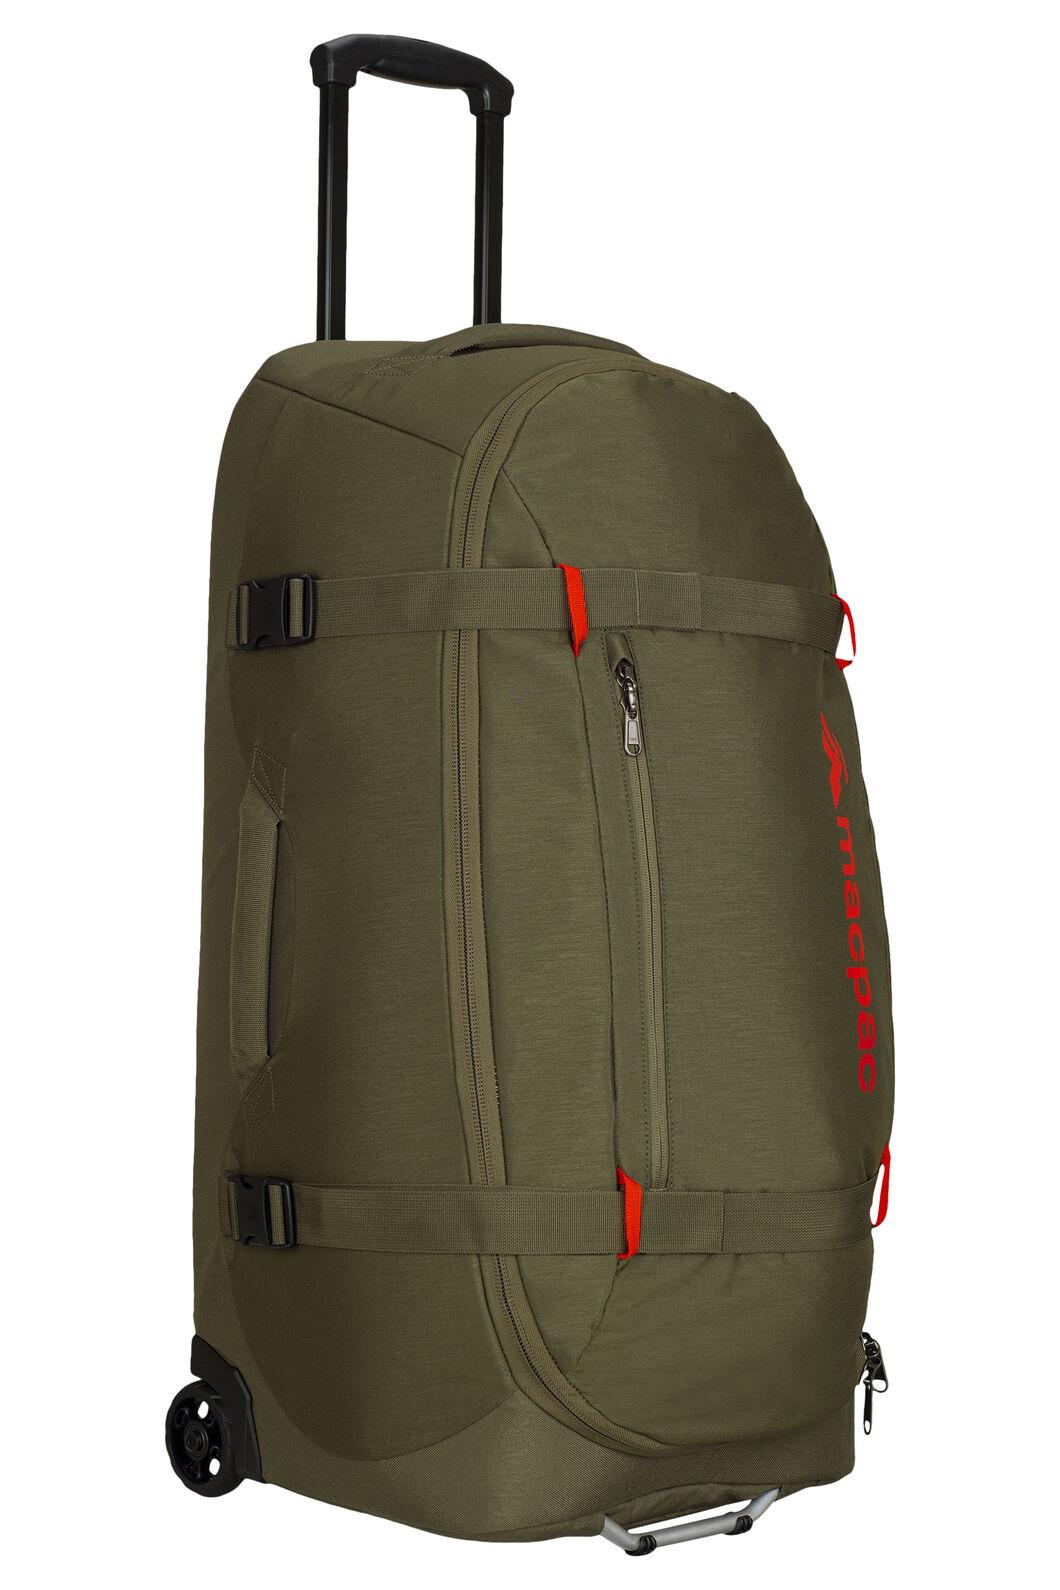 Macpac Global 80L Travel Bag, Grape Leaf, hi-res